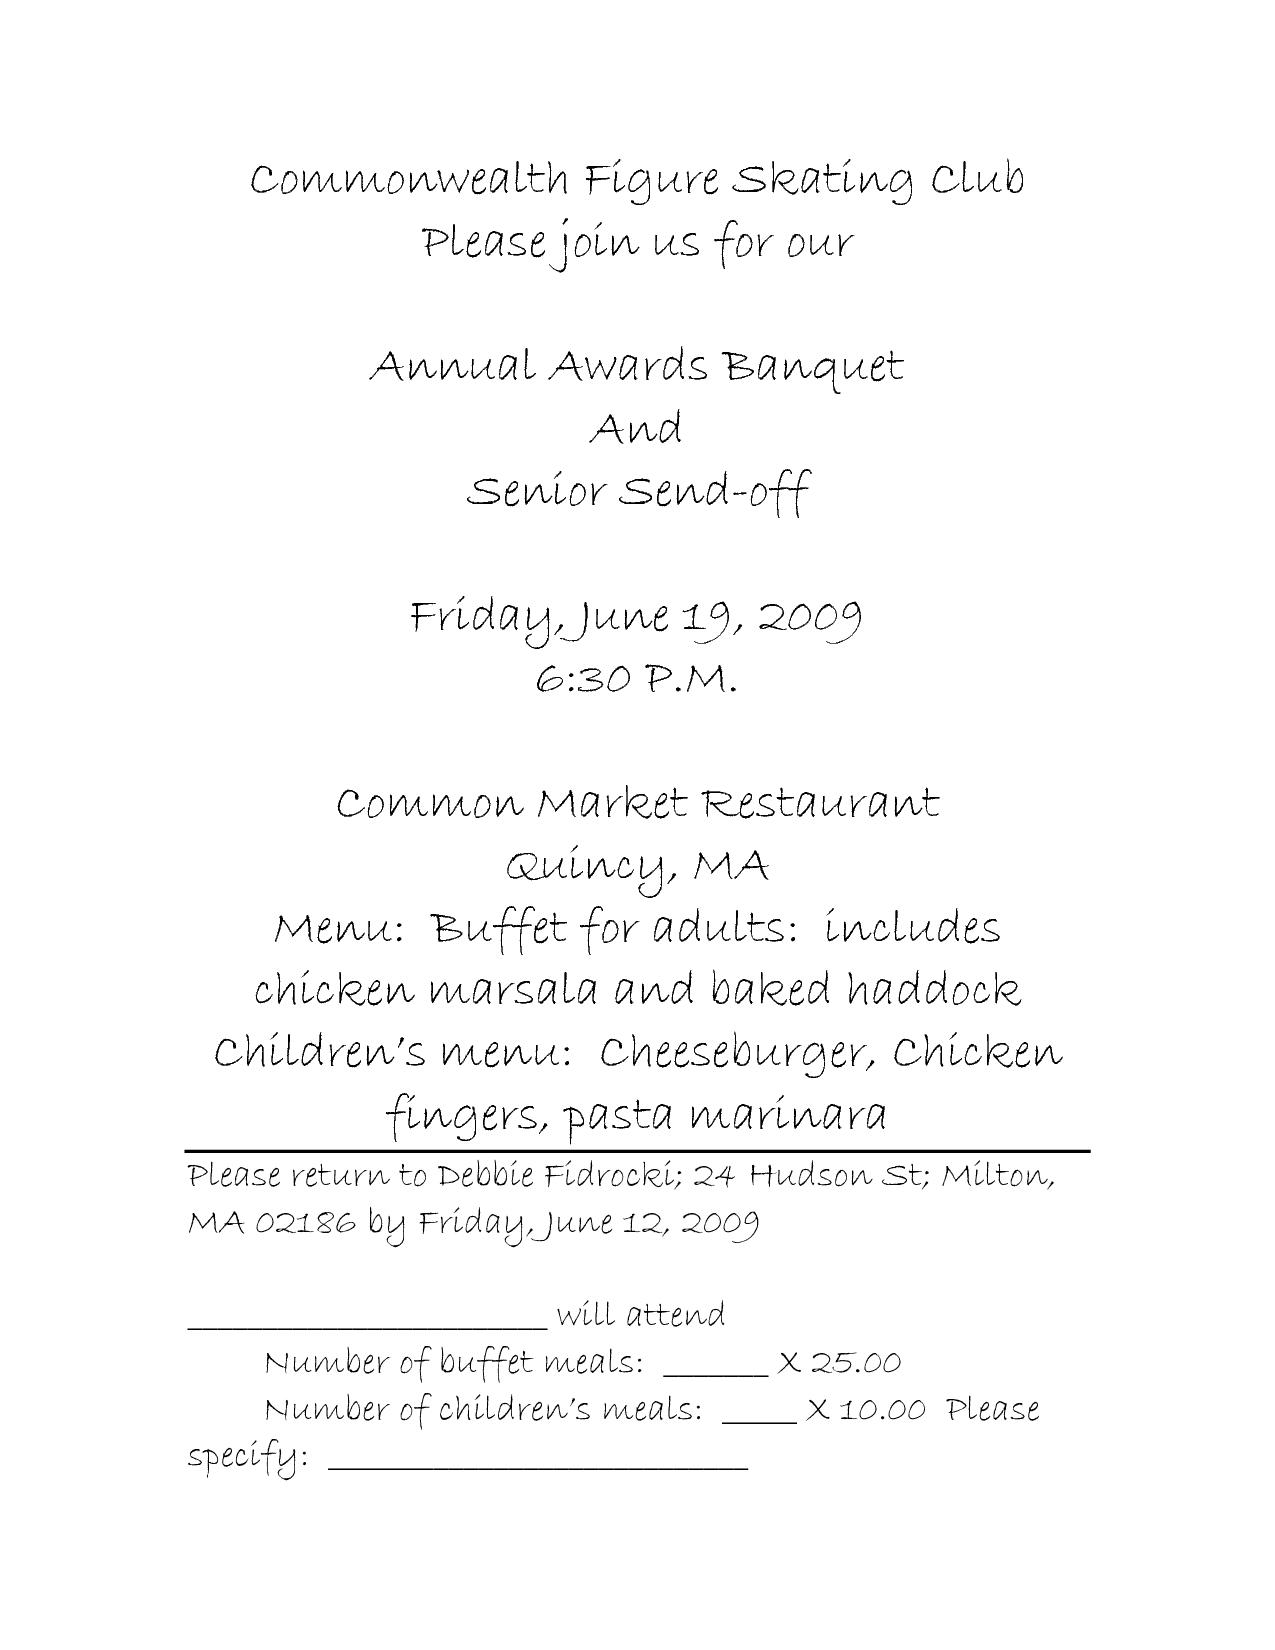 Charity Luncheon Invitations